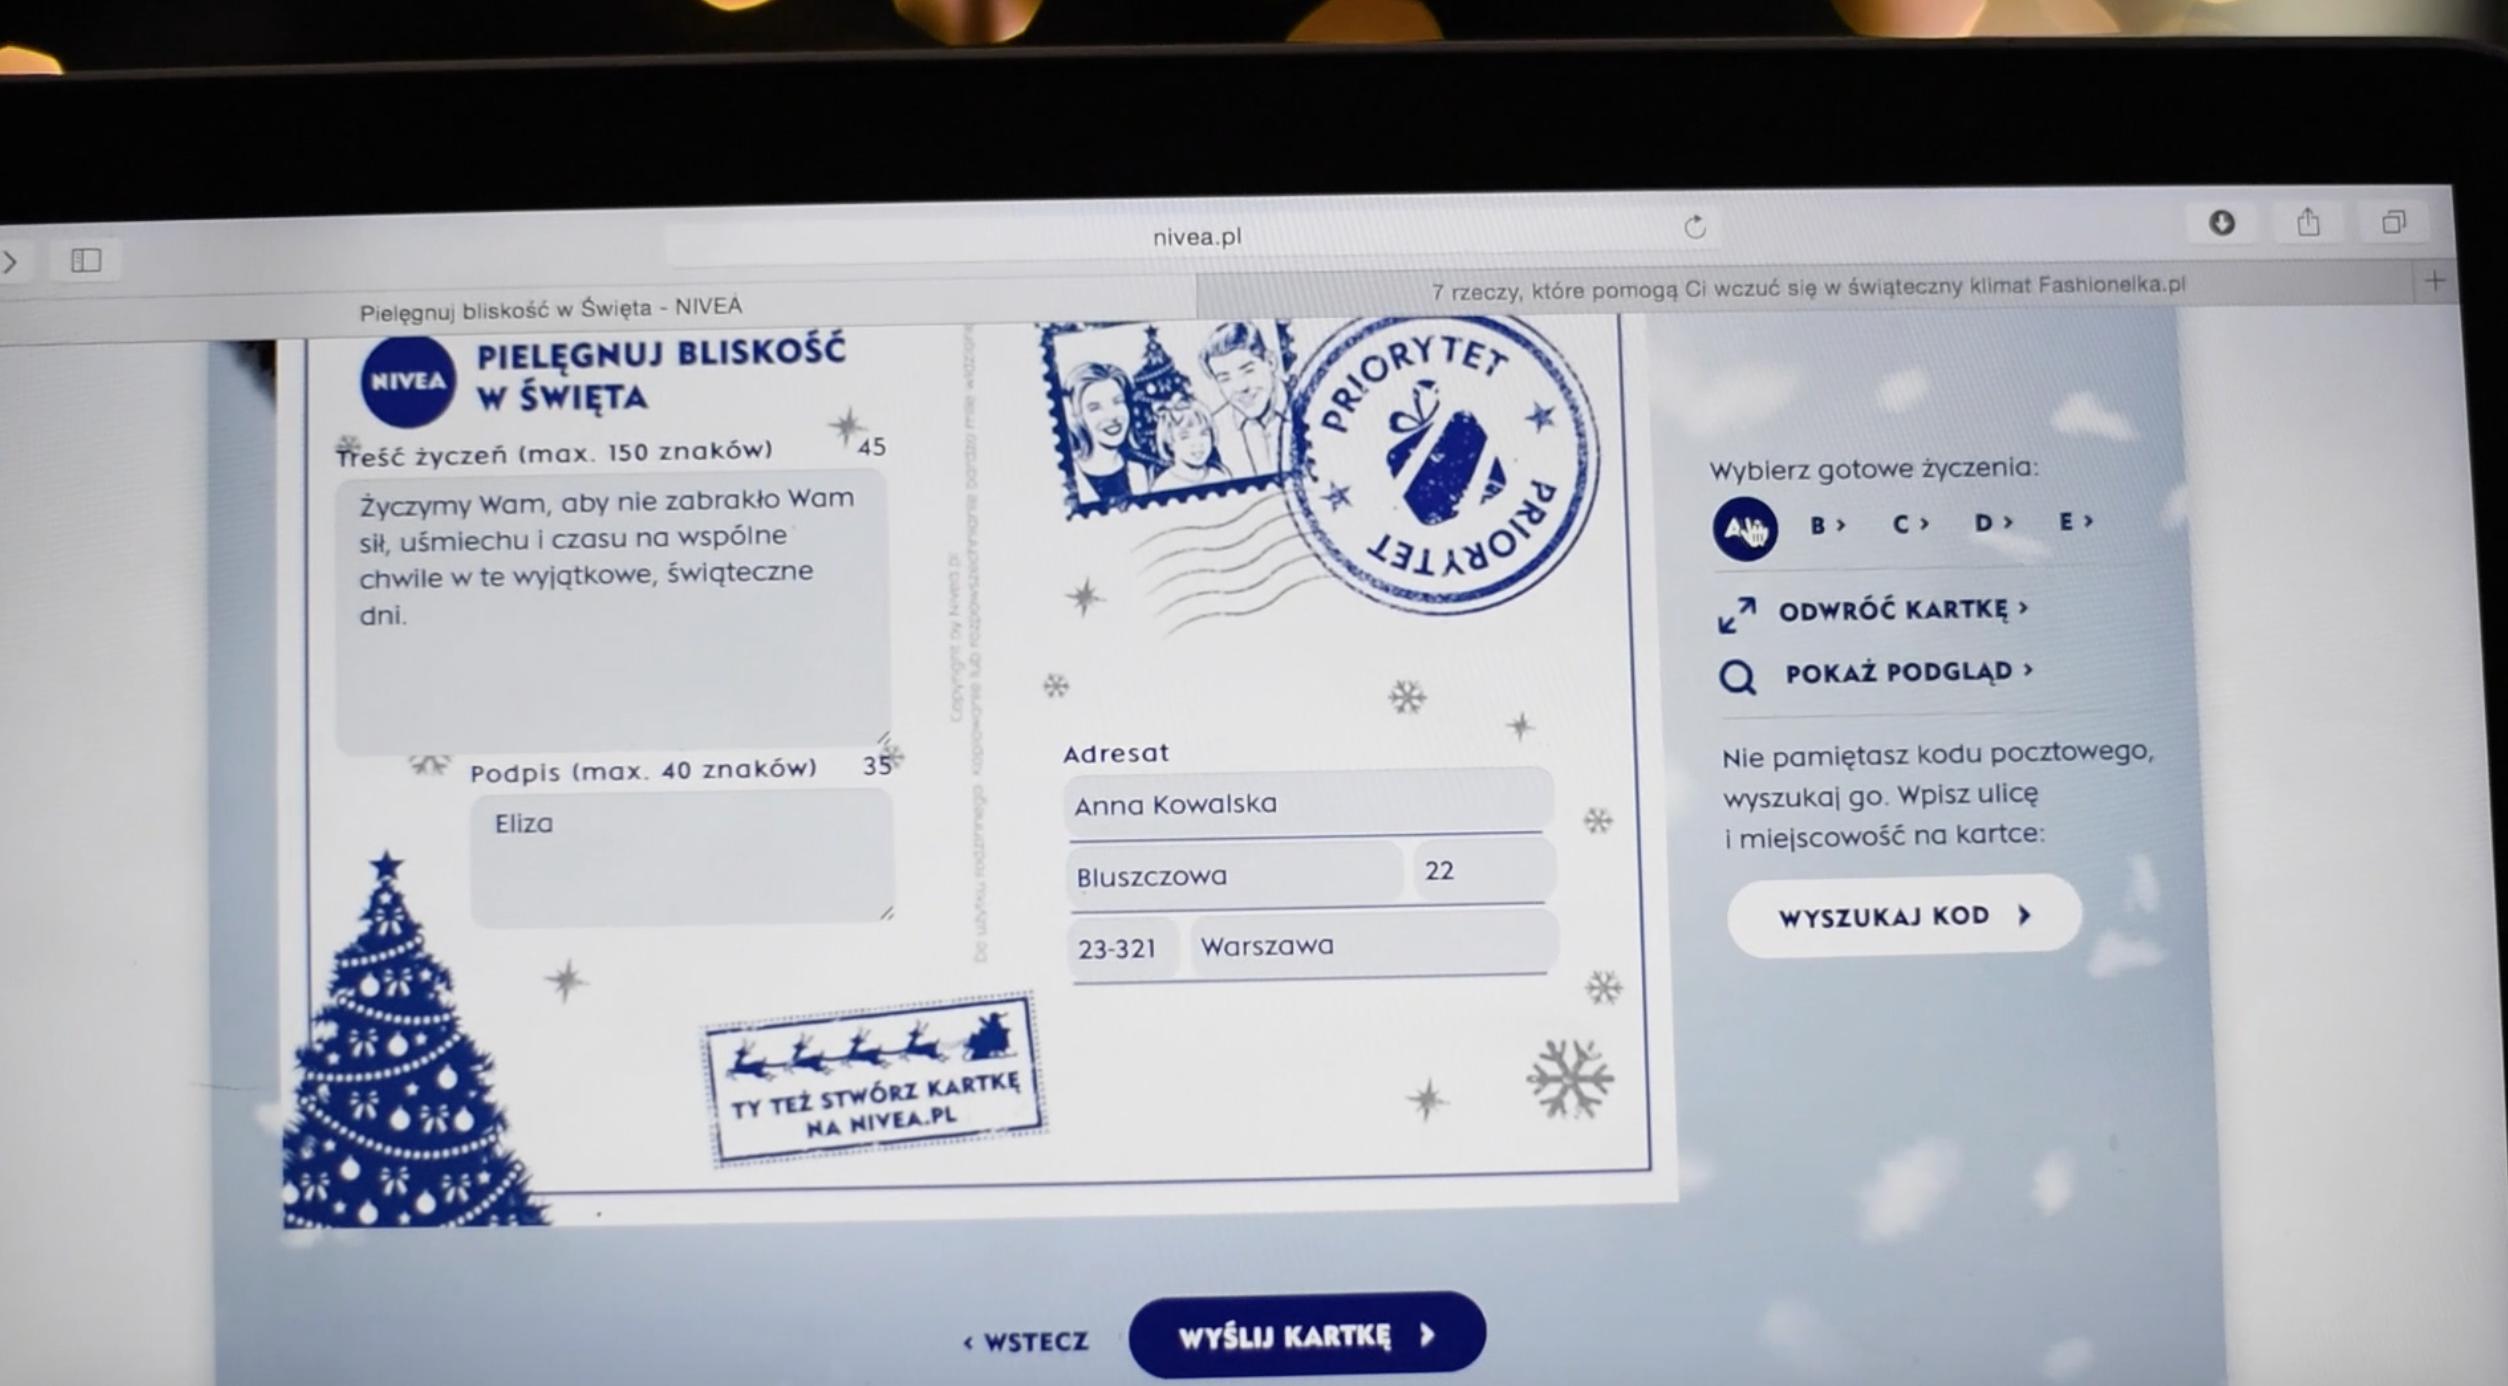 Zrzut ekranu 2015-12-07 o 11.05.38